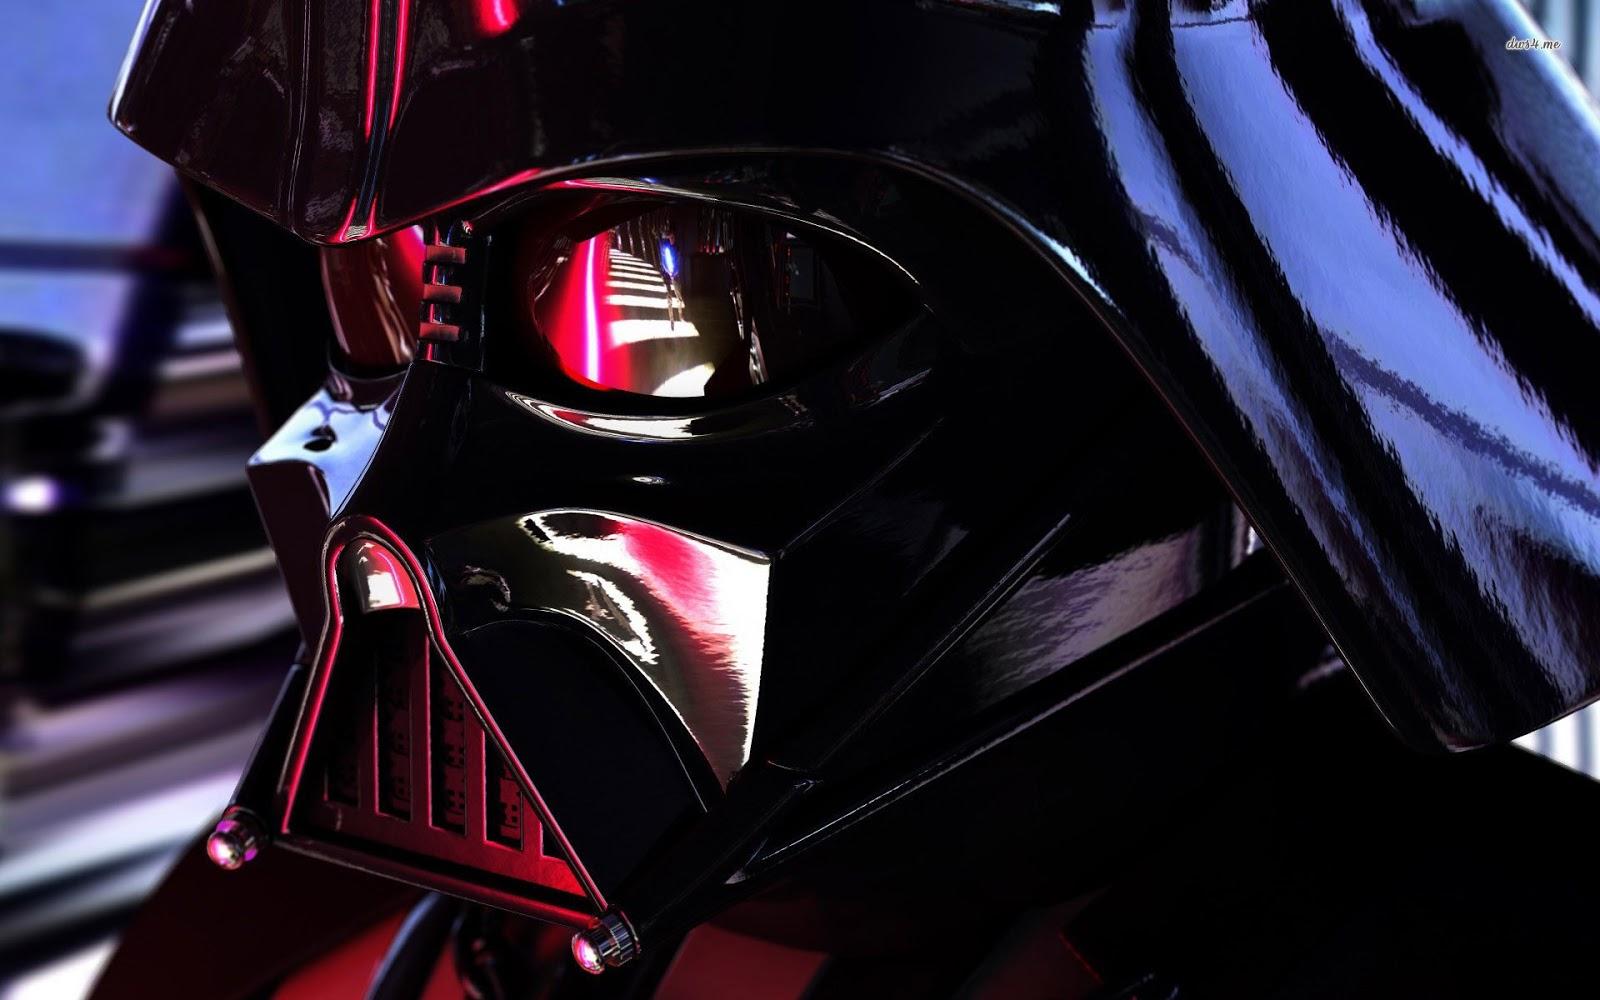 Demonic Darth Vader Wallpaper - 1080p Darth Vader Wallpaper Hd , HD Wallpaper & Backgrounds